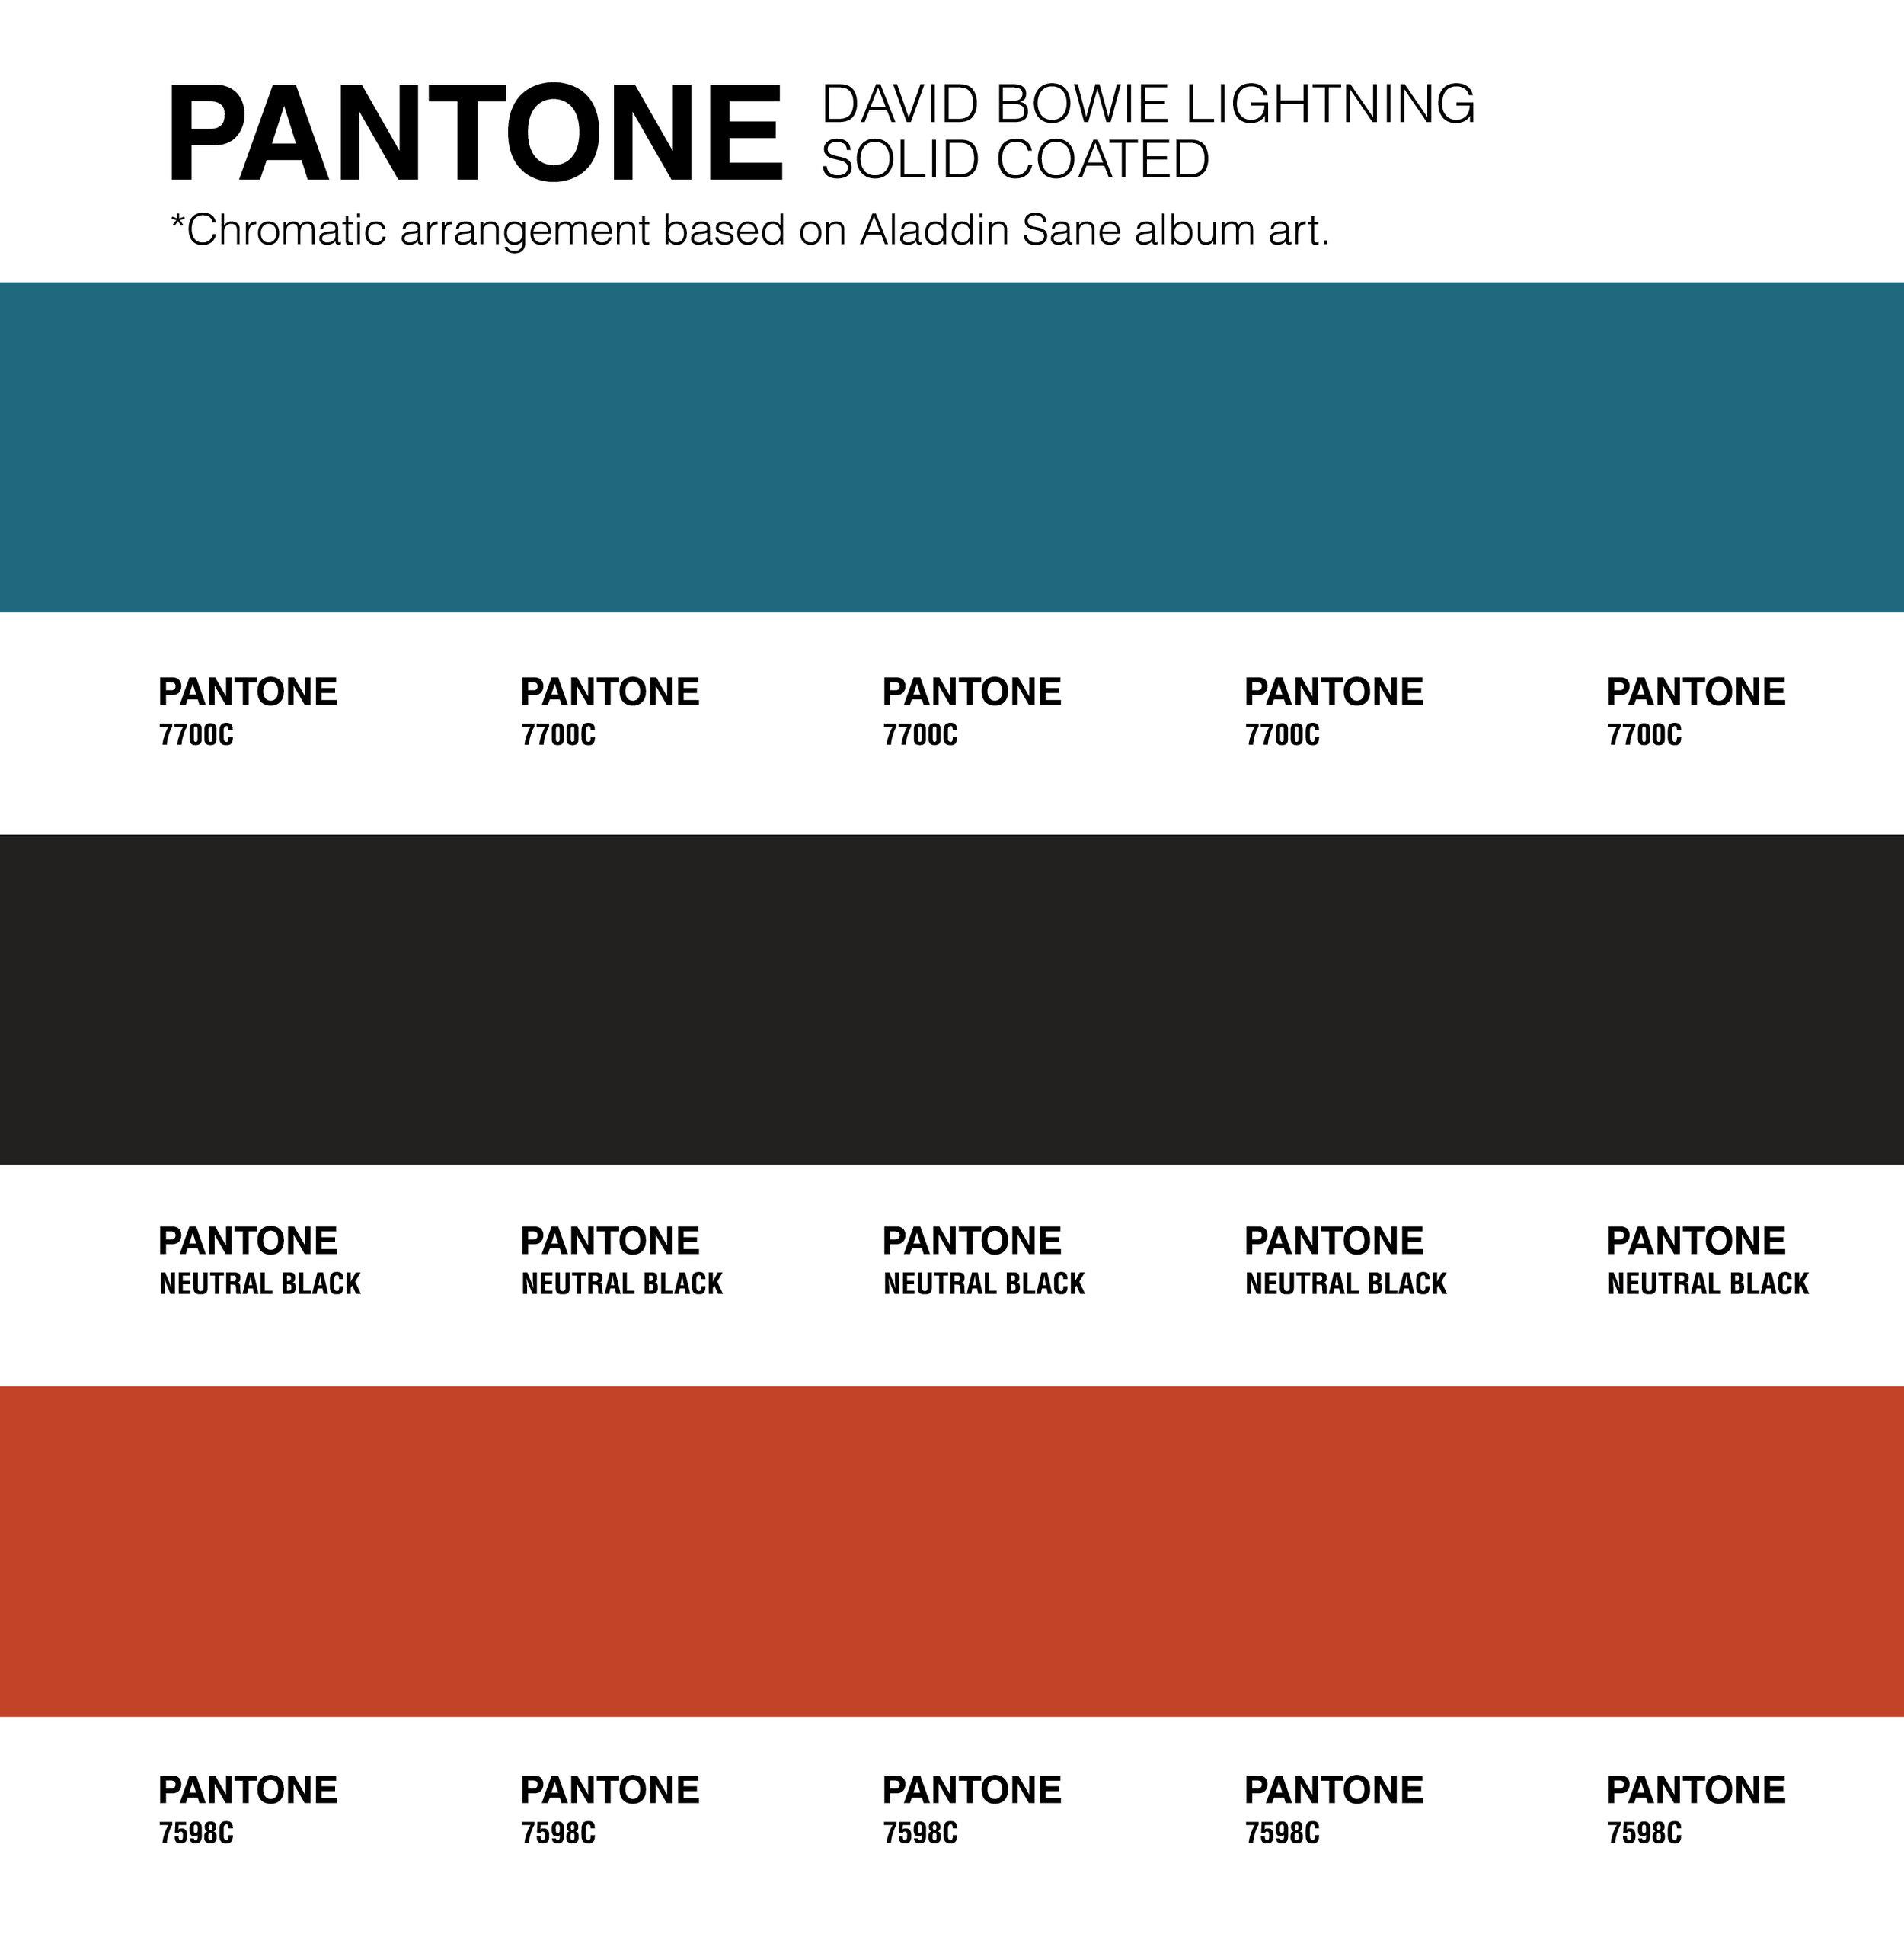 Pantone Lightning